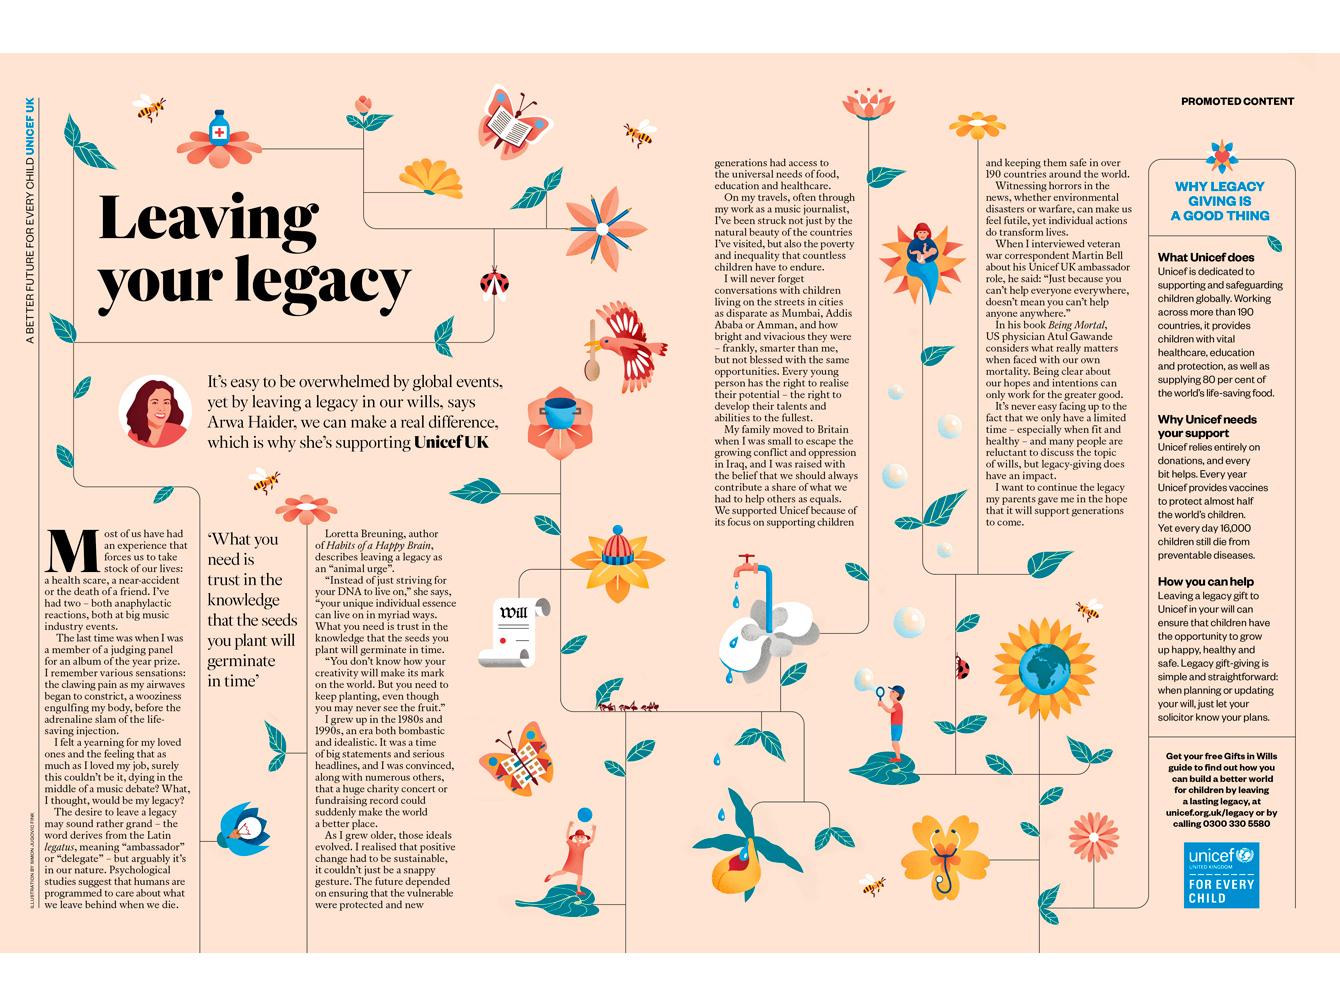 Leaving your legacy leaving legacy leaving your legacy icons illustration editorial illustration unicef